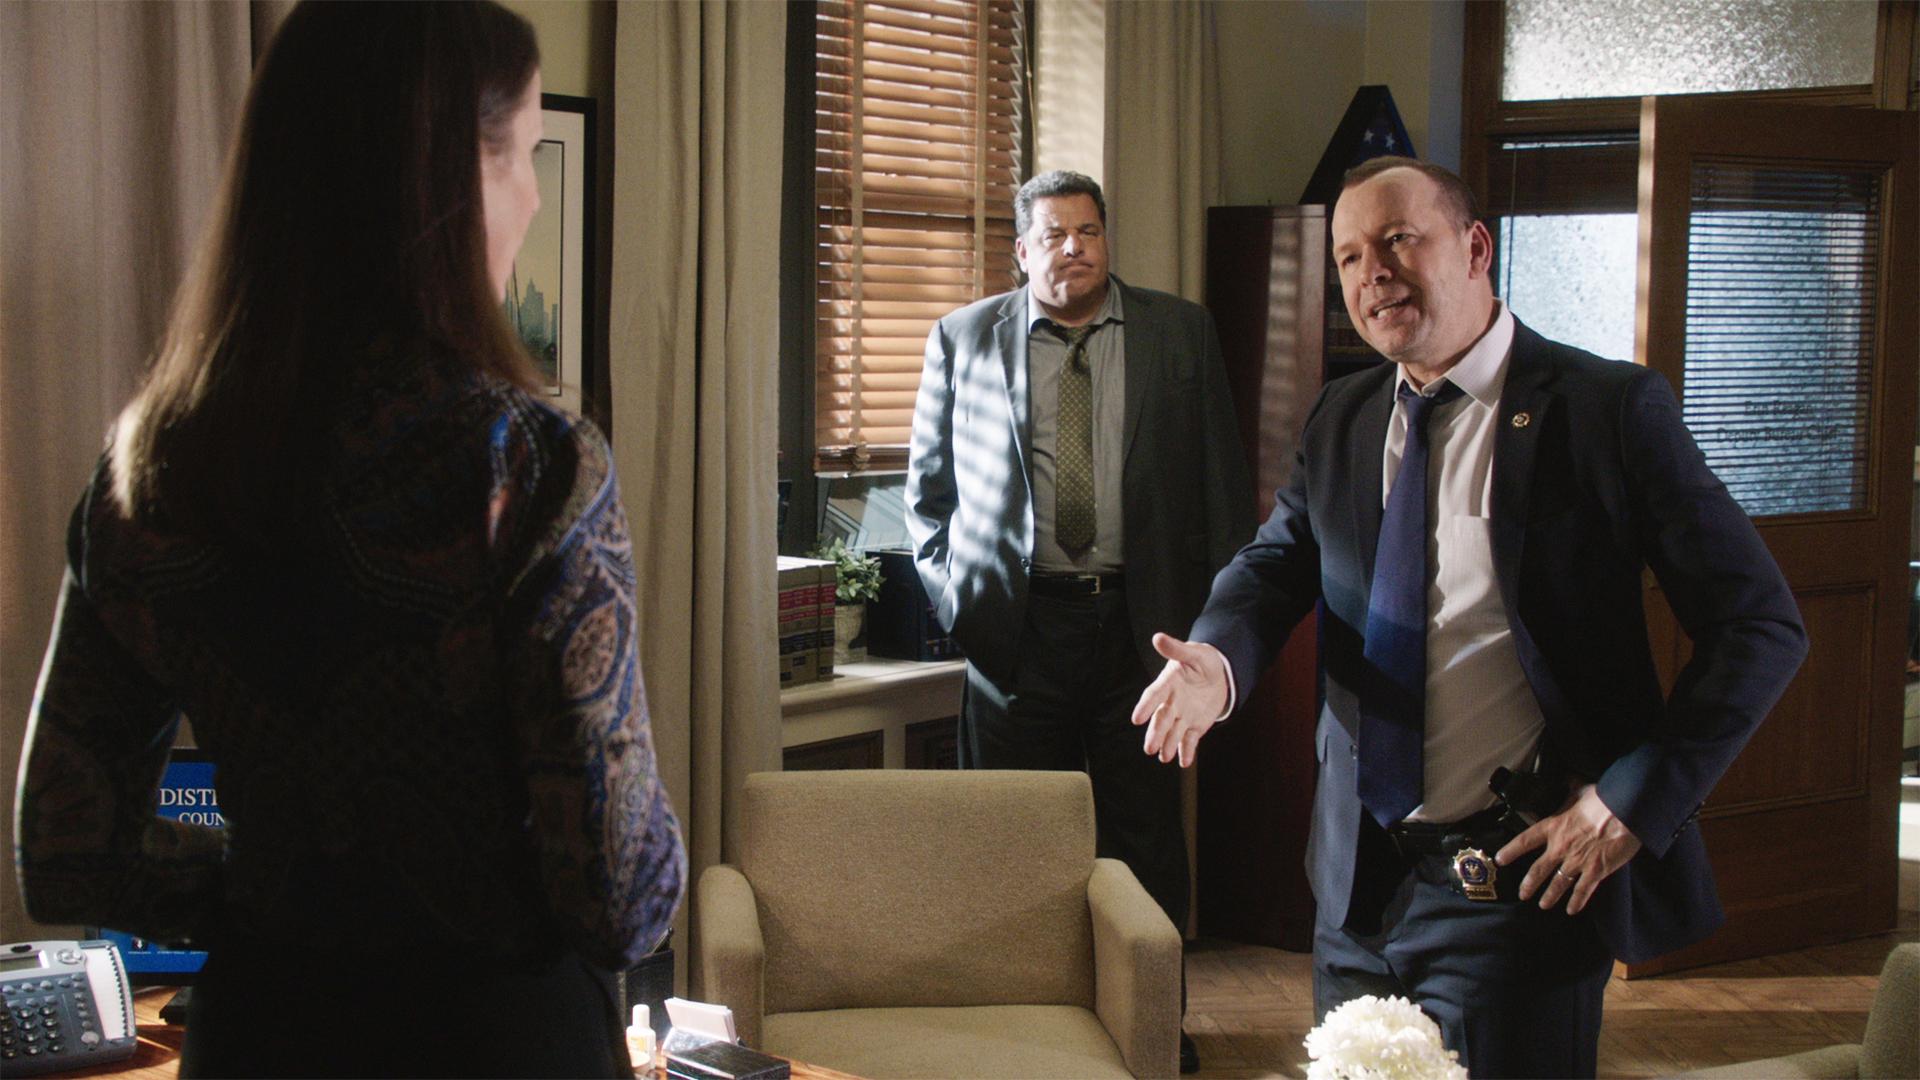 Watch Blue Bloods Season 7 Episode 7 Guilt By Association Full Show On Cbs All Access